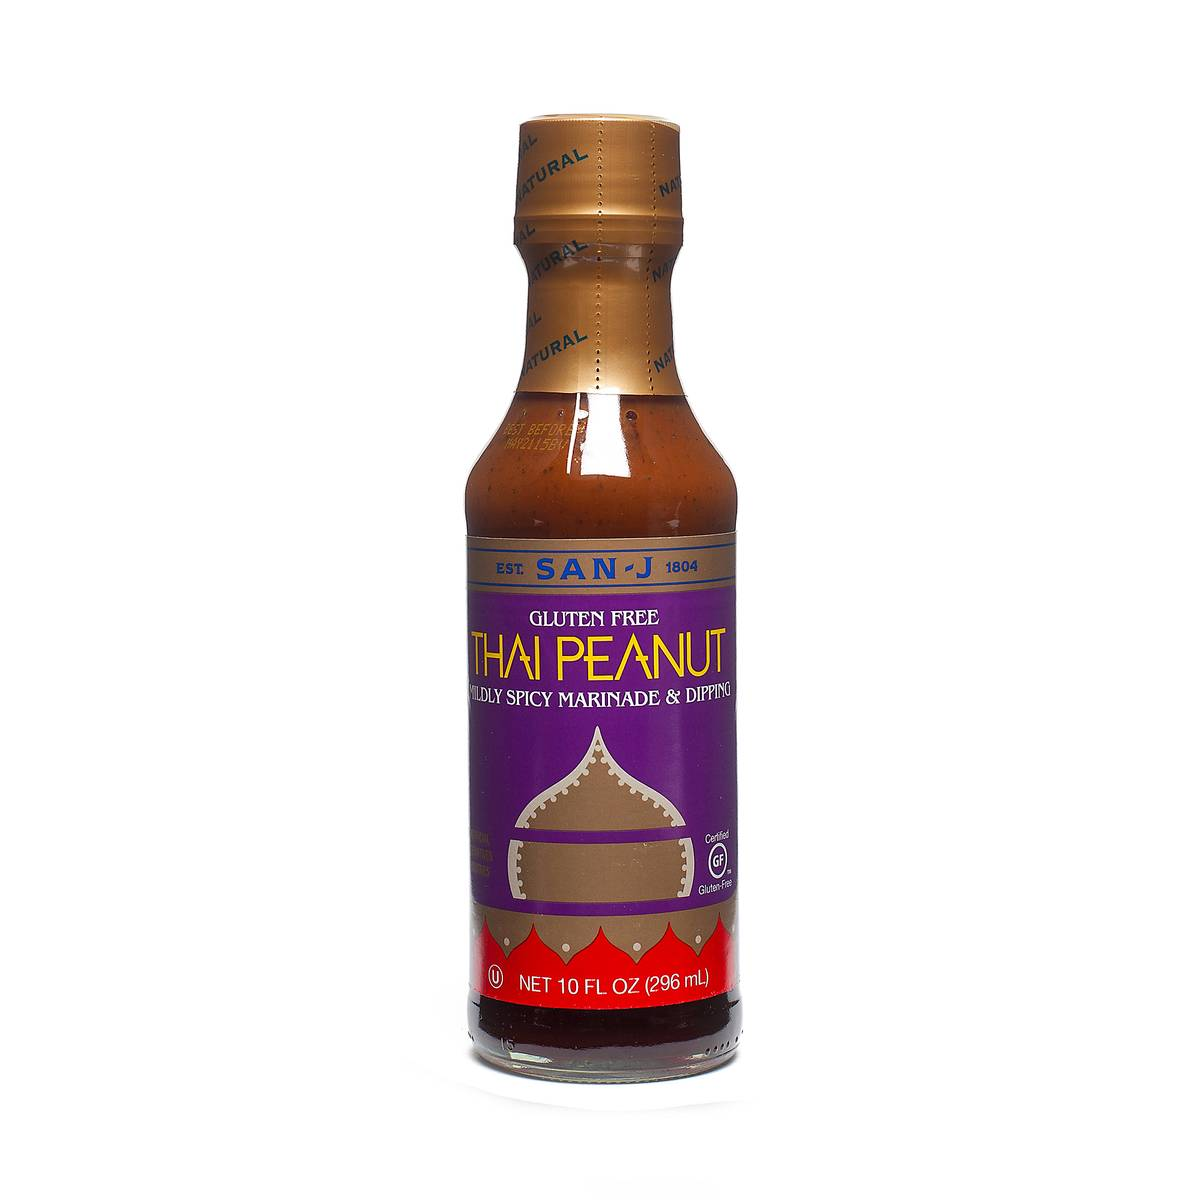 Thai Peanut Sauce by San J International - Thrive Market